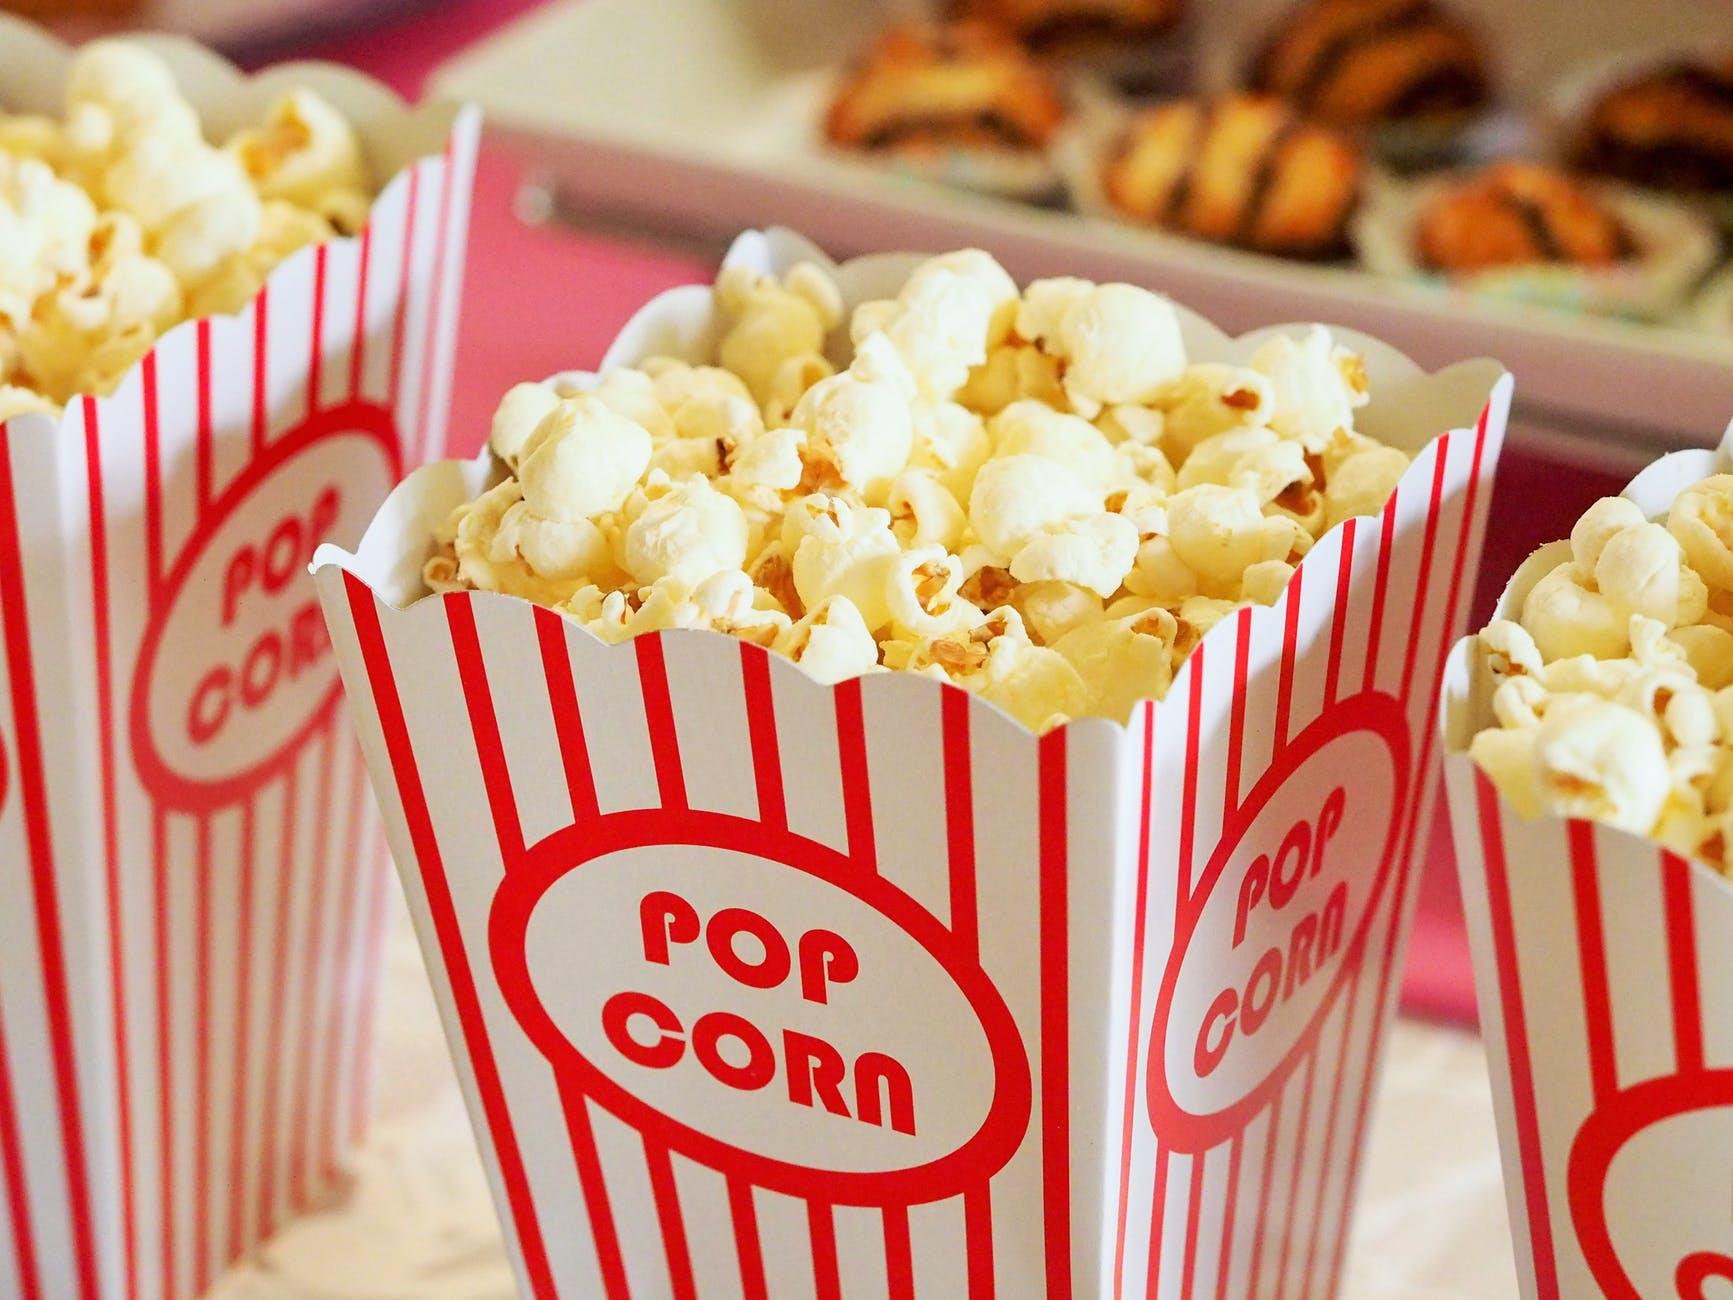 food snack popcorn movie theater